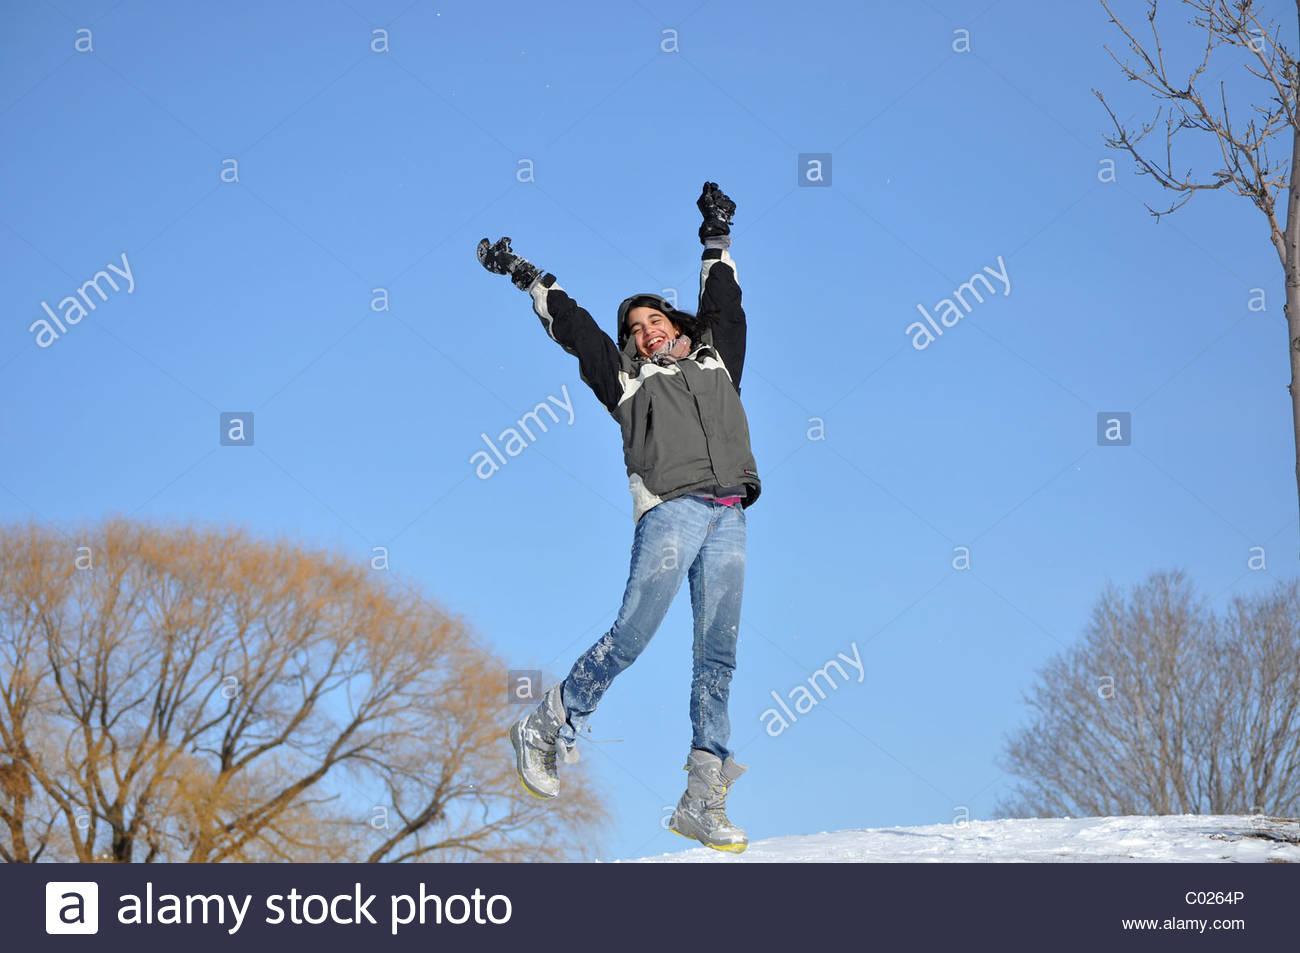 Hispanic immigrant family enjoying having fun in the first Winter snow - Stock Image